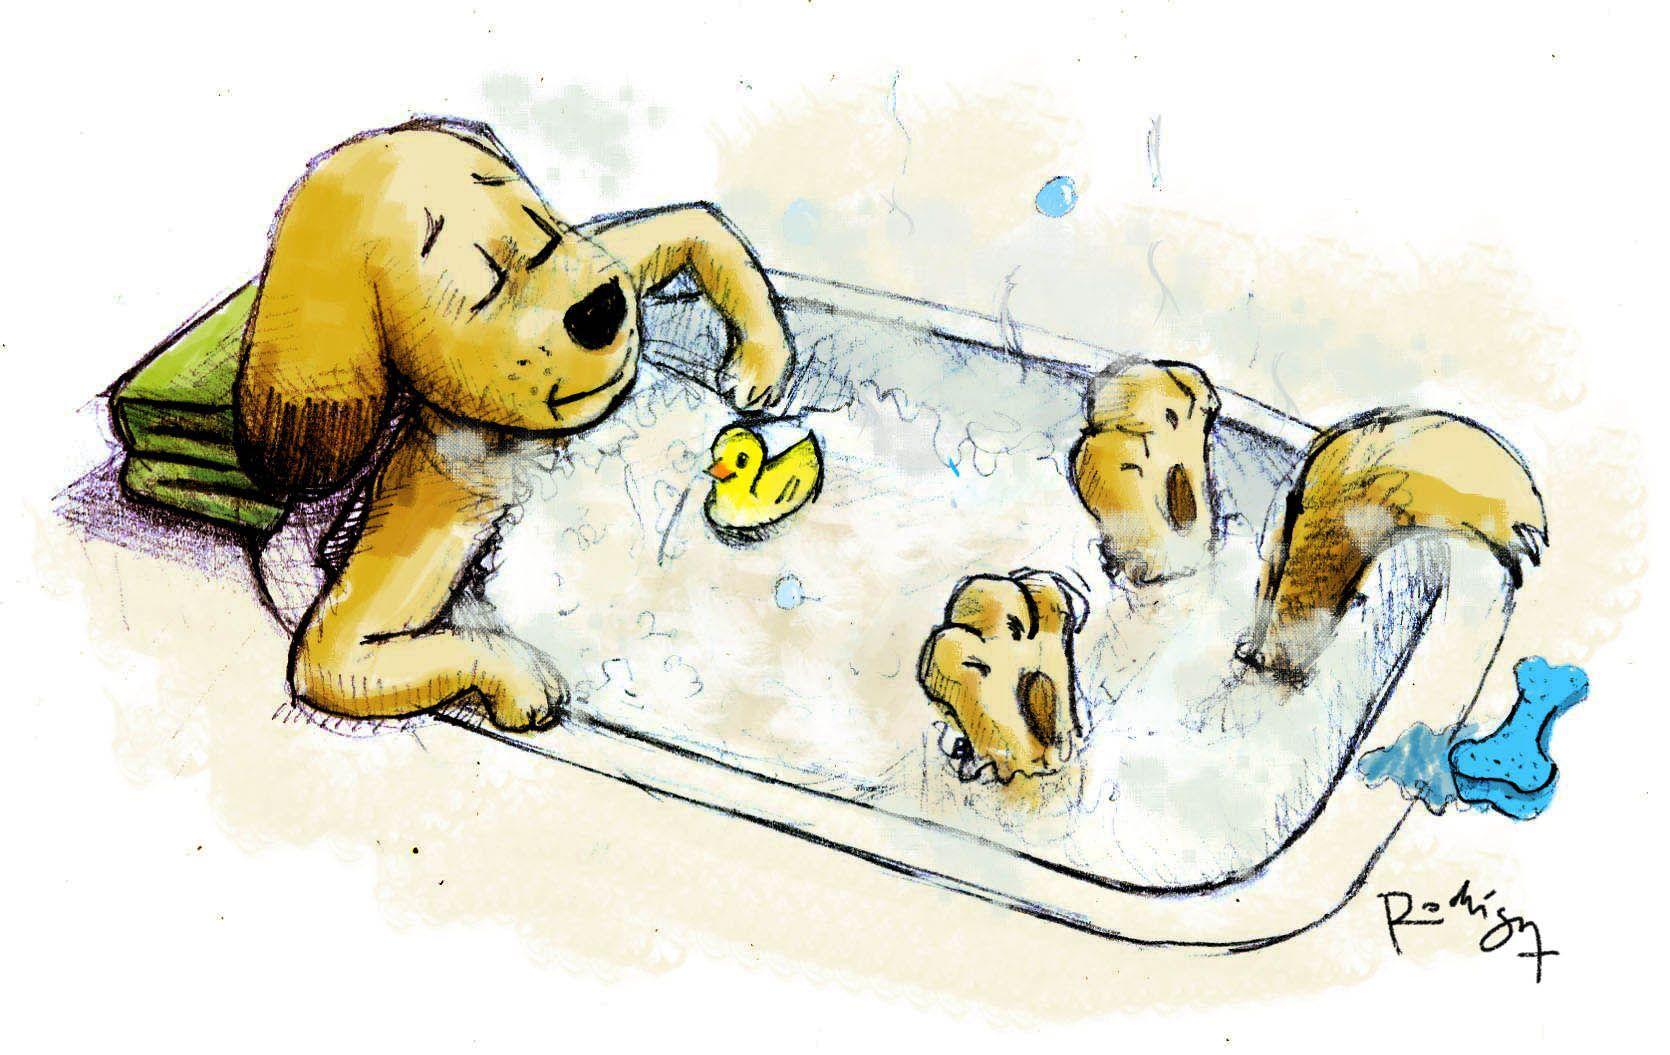 Perro Banandose Cute Illustration Doggie Style Illustration